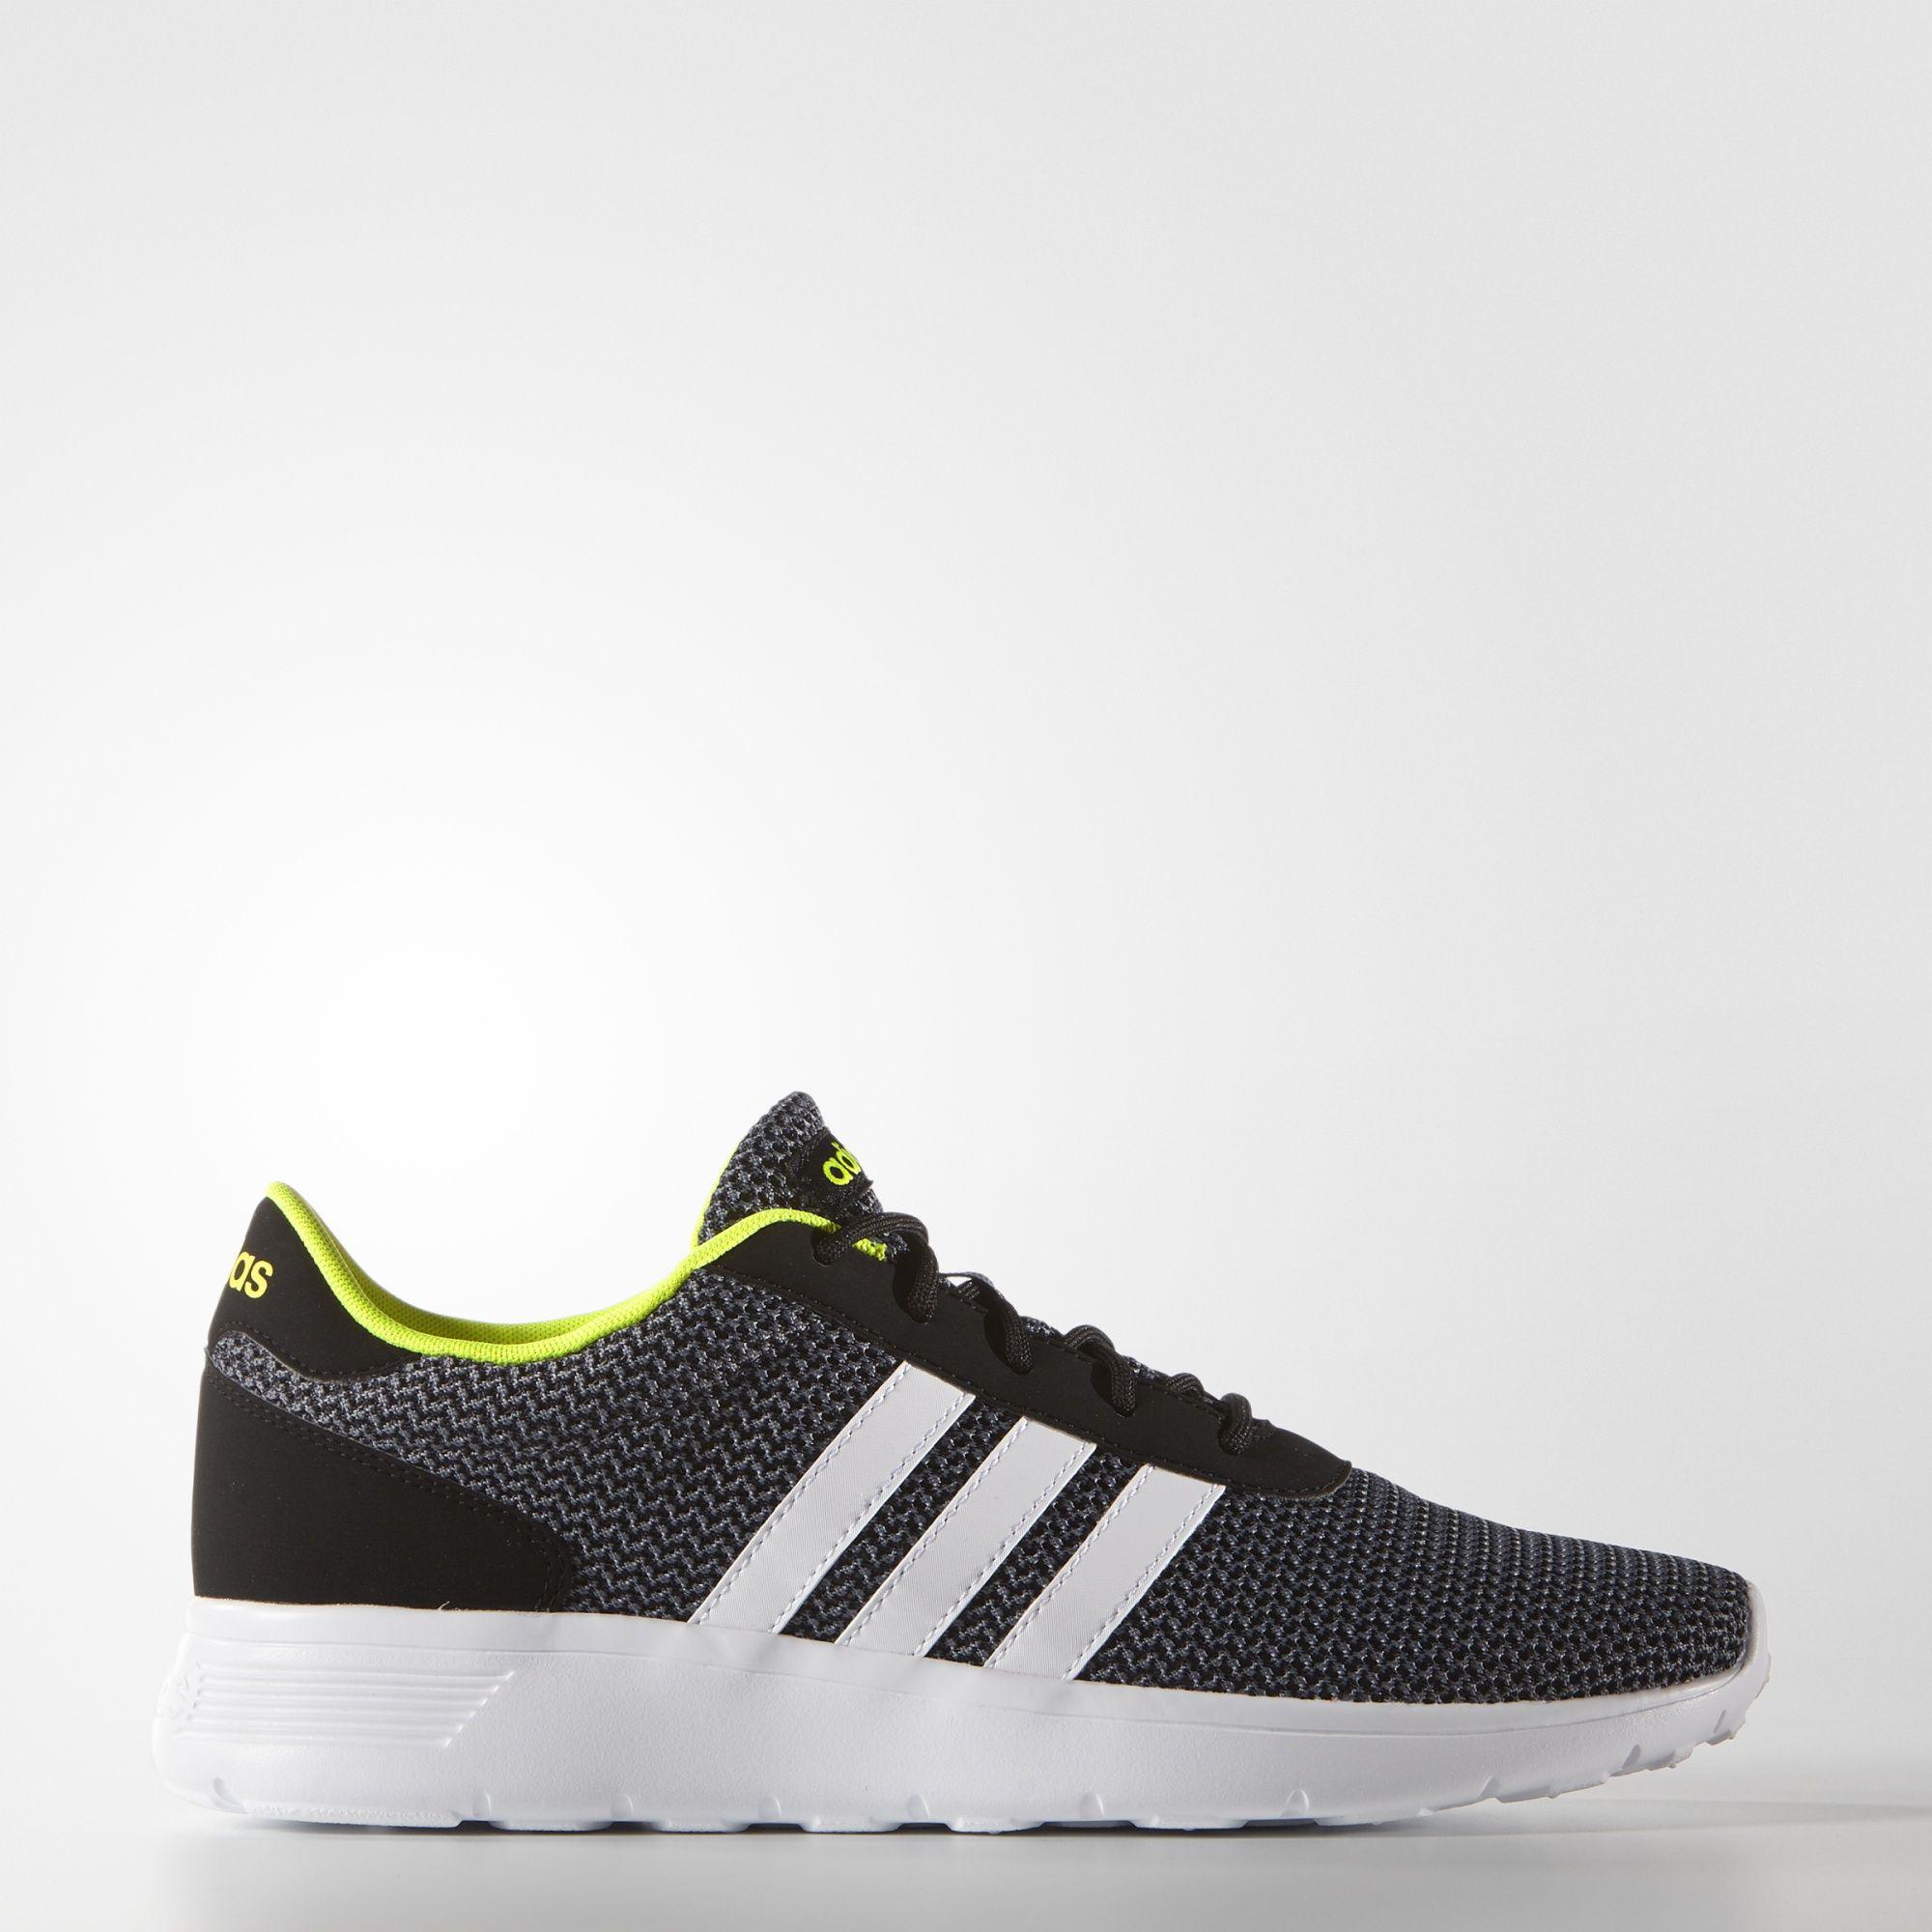 Mens Shoes adidas Lite Racer Black/Black/Grey